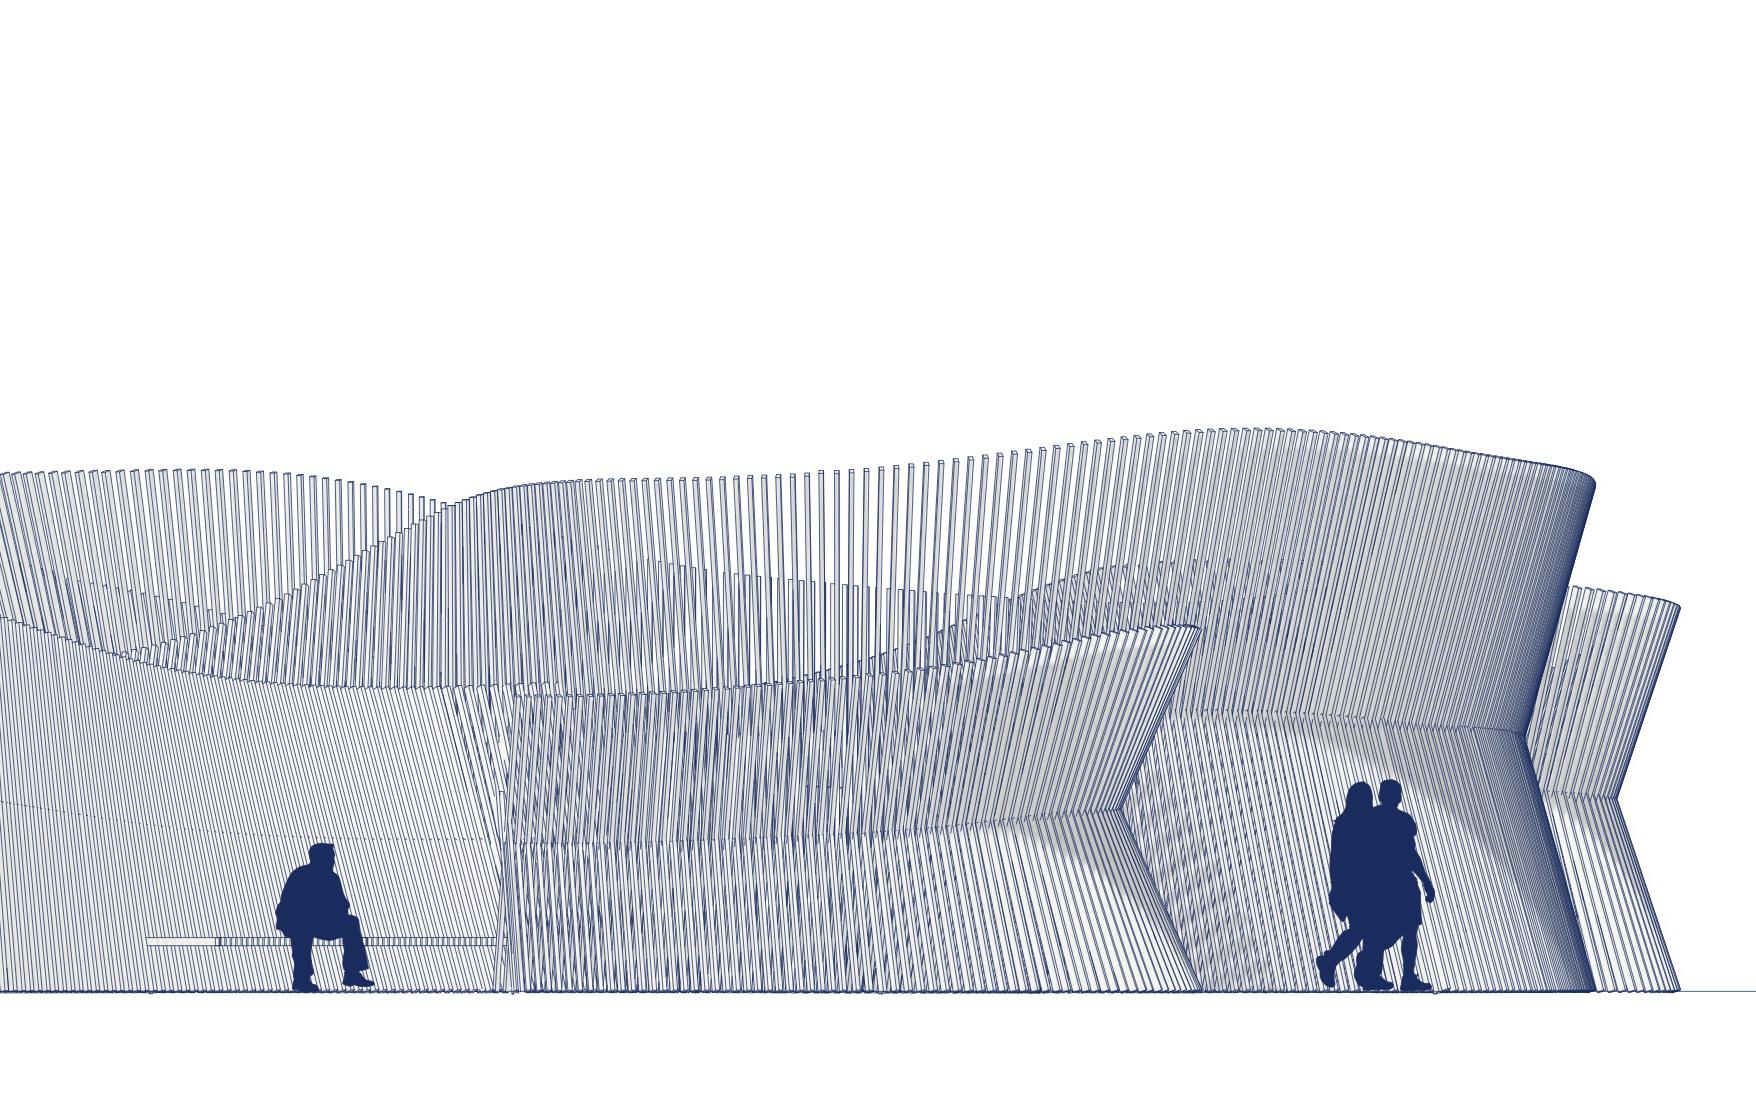 Pavillon MAA – Kongens have